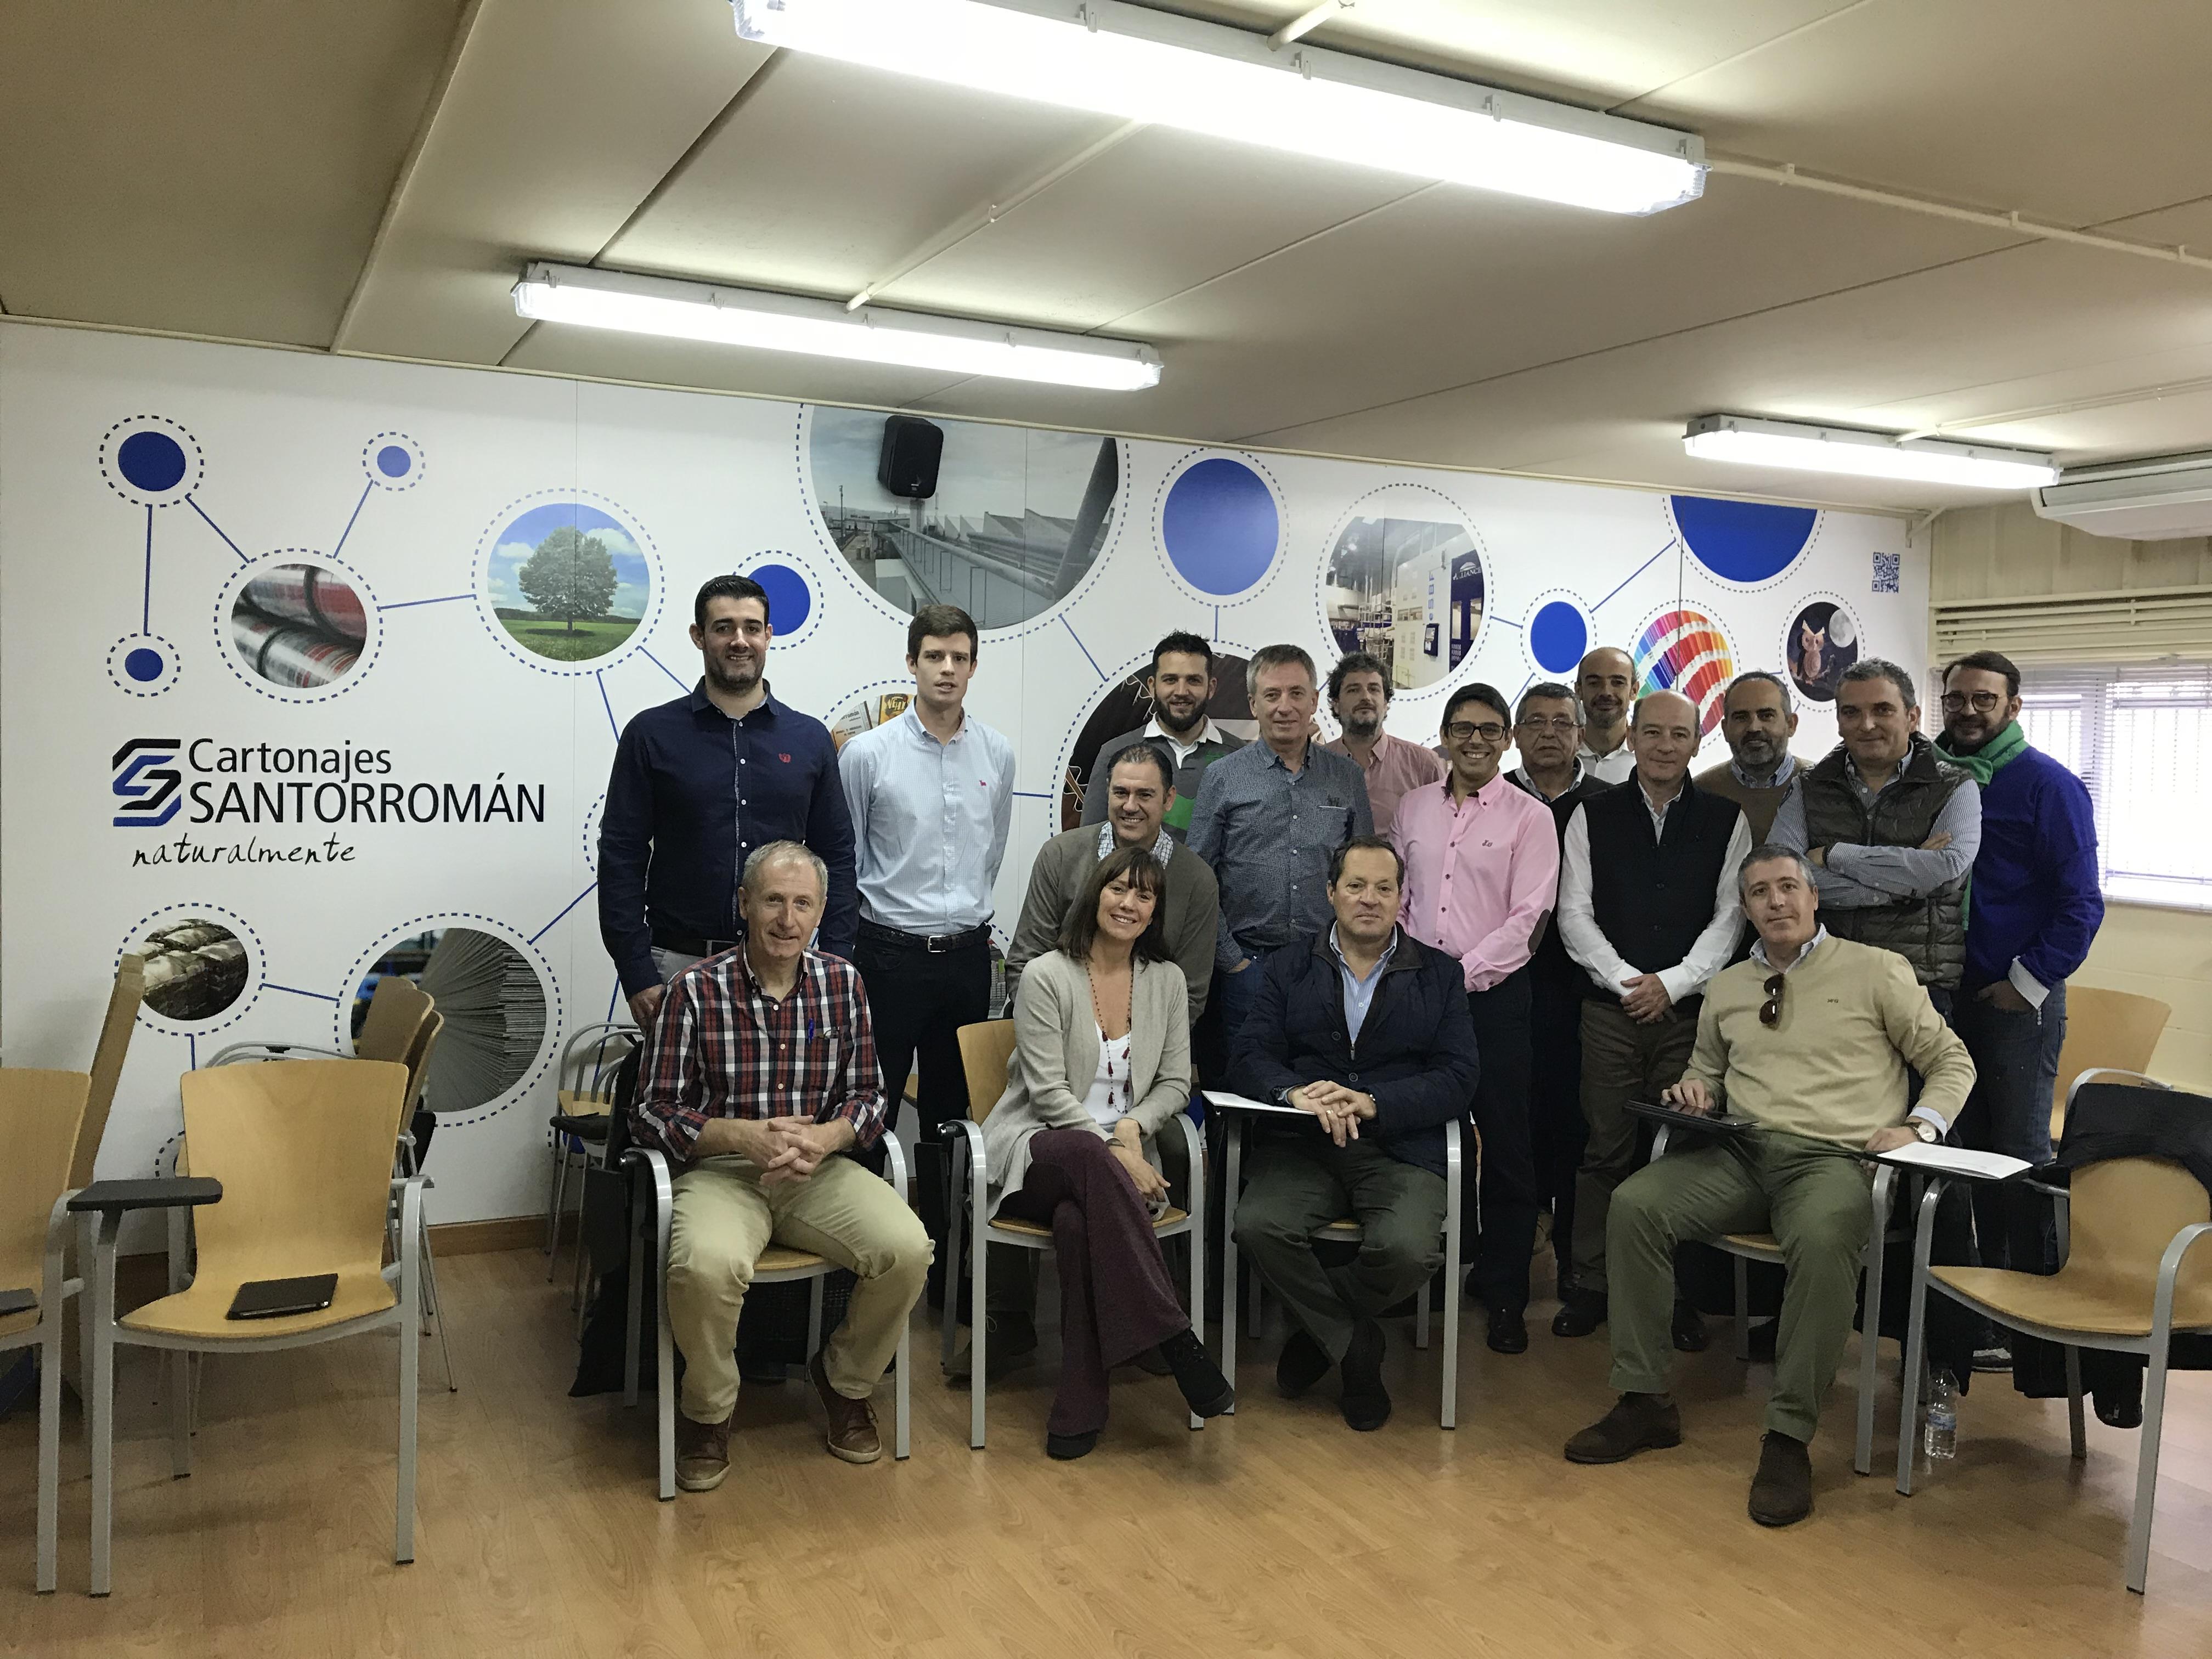 Espabox participa en las jornadas de formación de Barna Consulting group